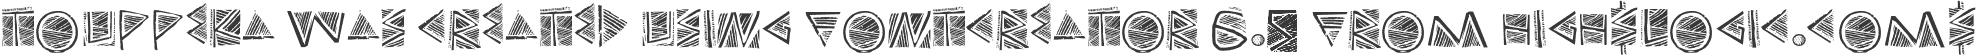 Touppeka was created using FontCreator 6.5 from High-Logic.com